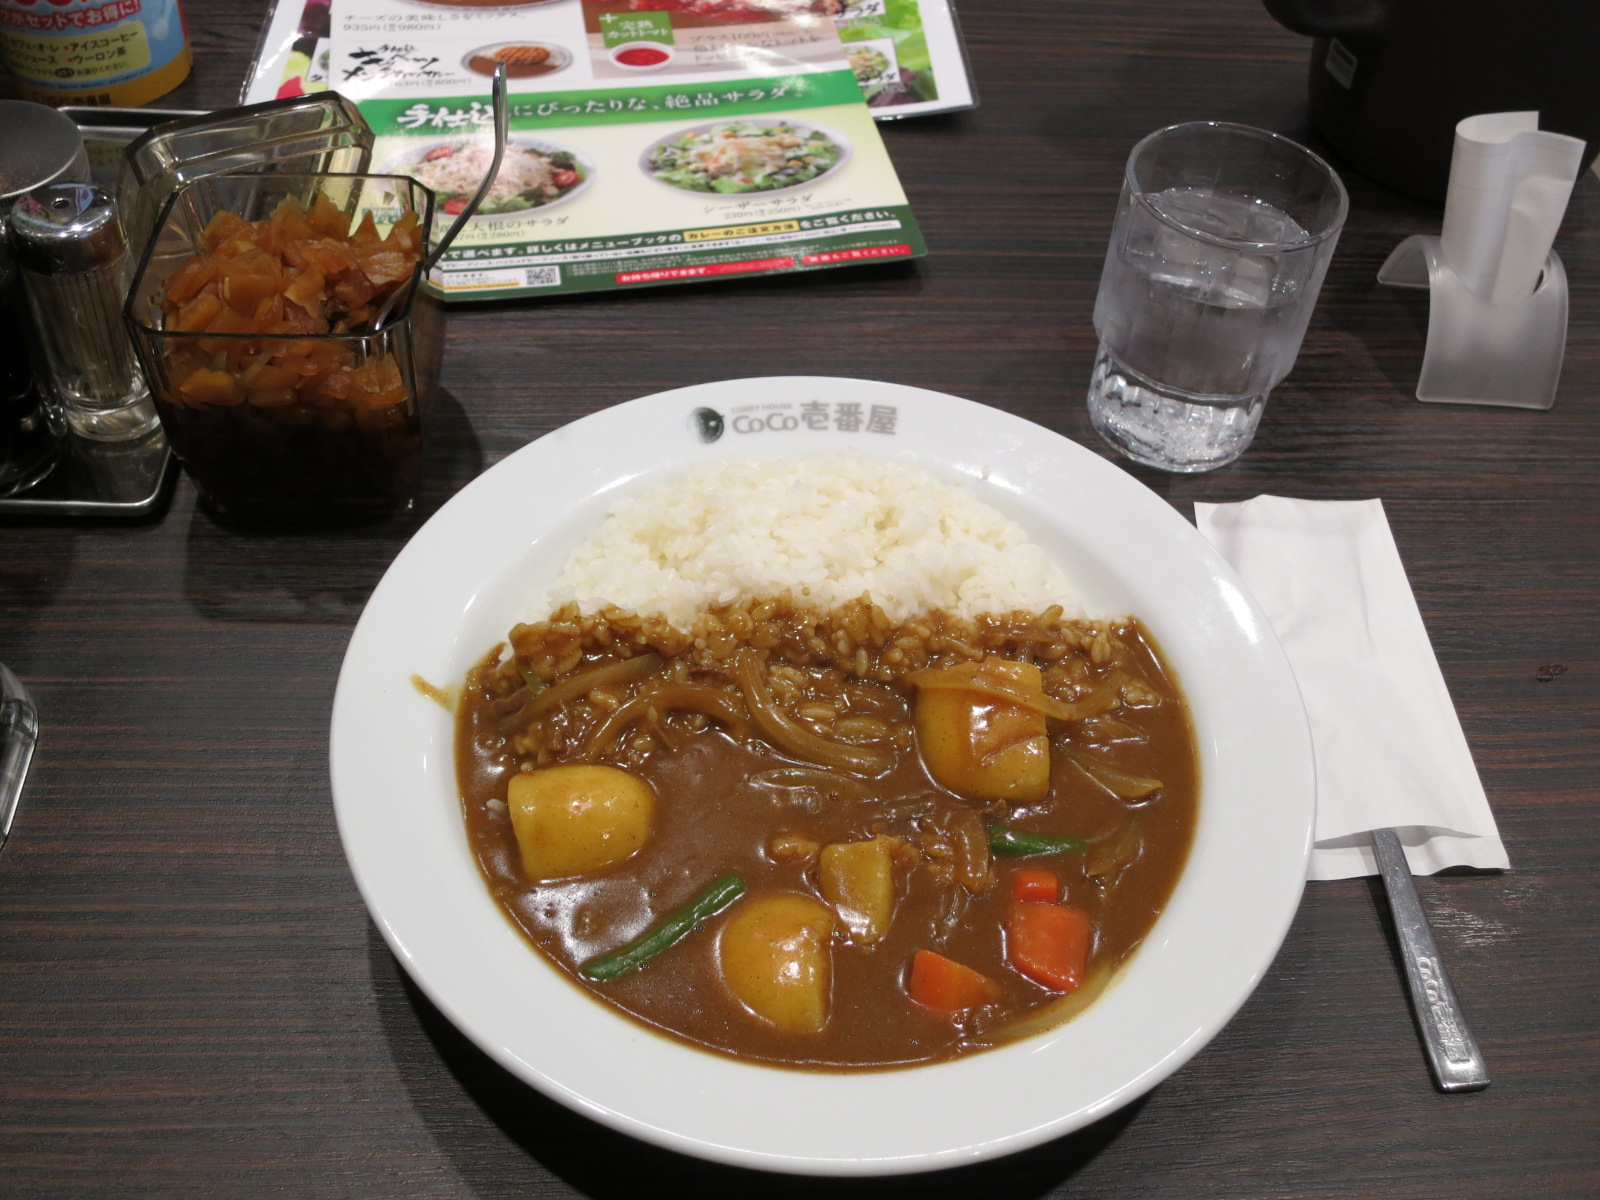 CoCo壱番屋 OBPツイン21店